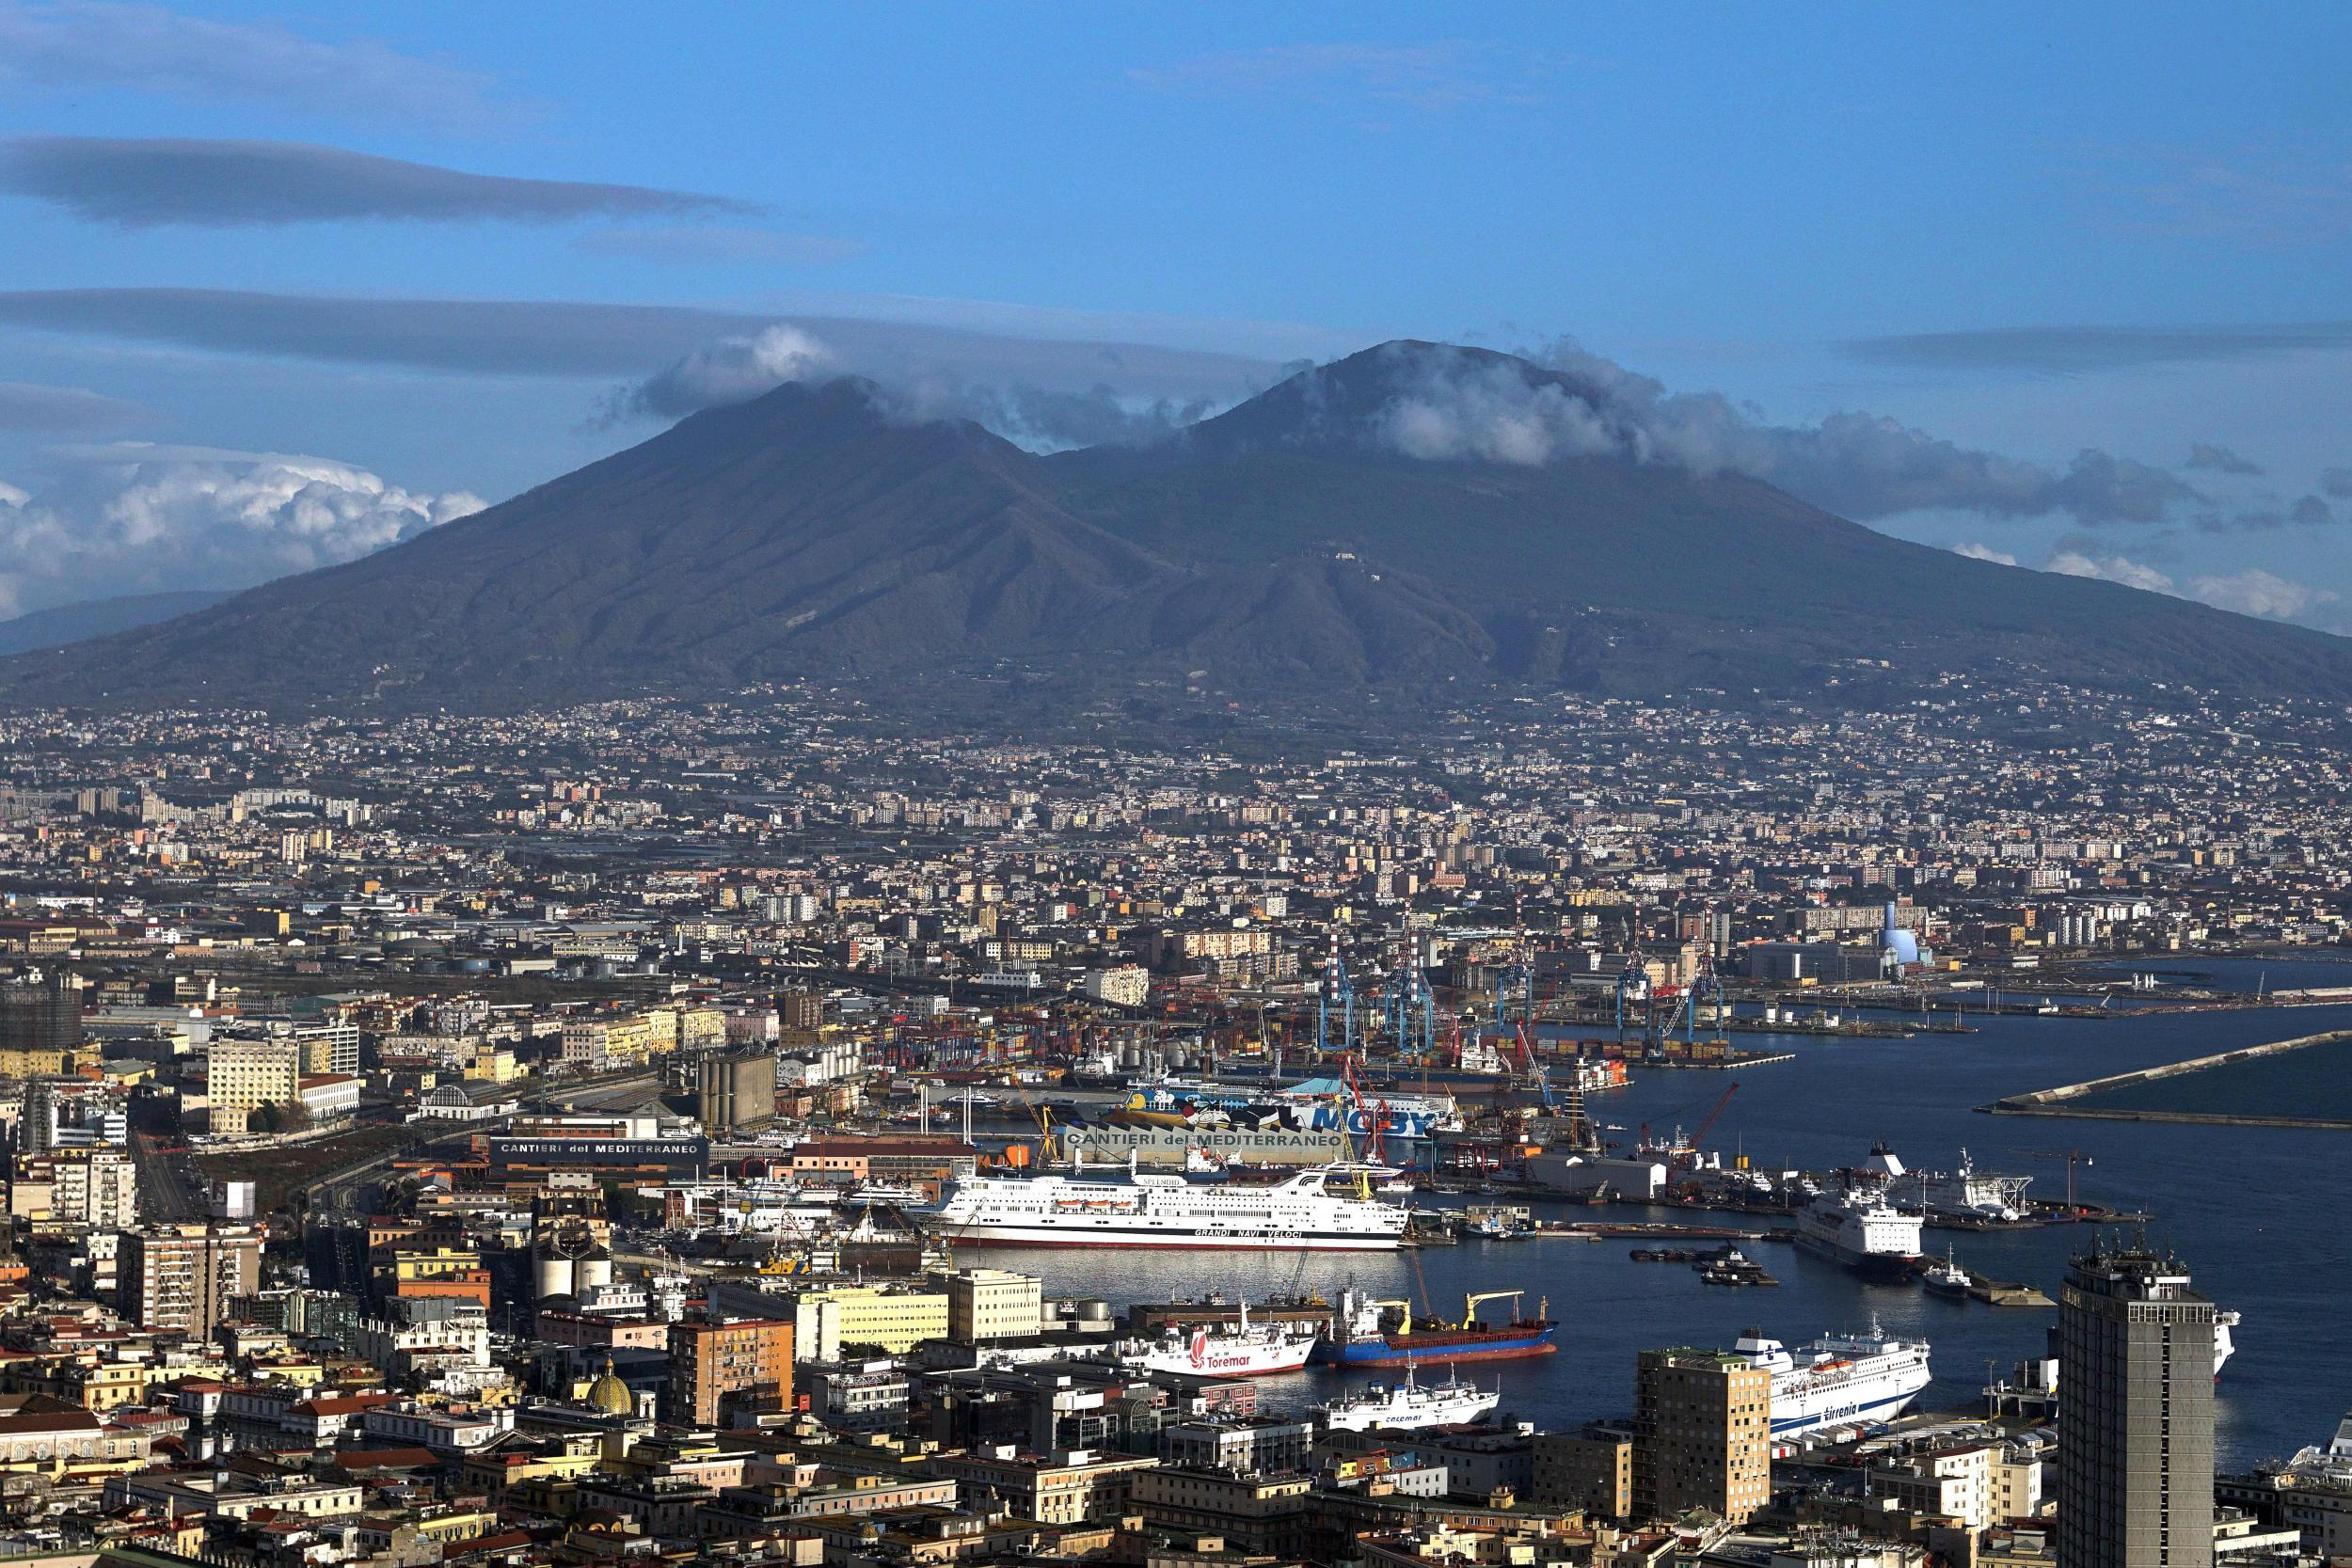 'Very dangerous' supervolcano under Naples showing signs of reawakening